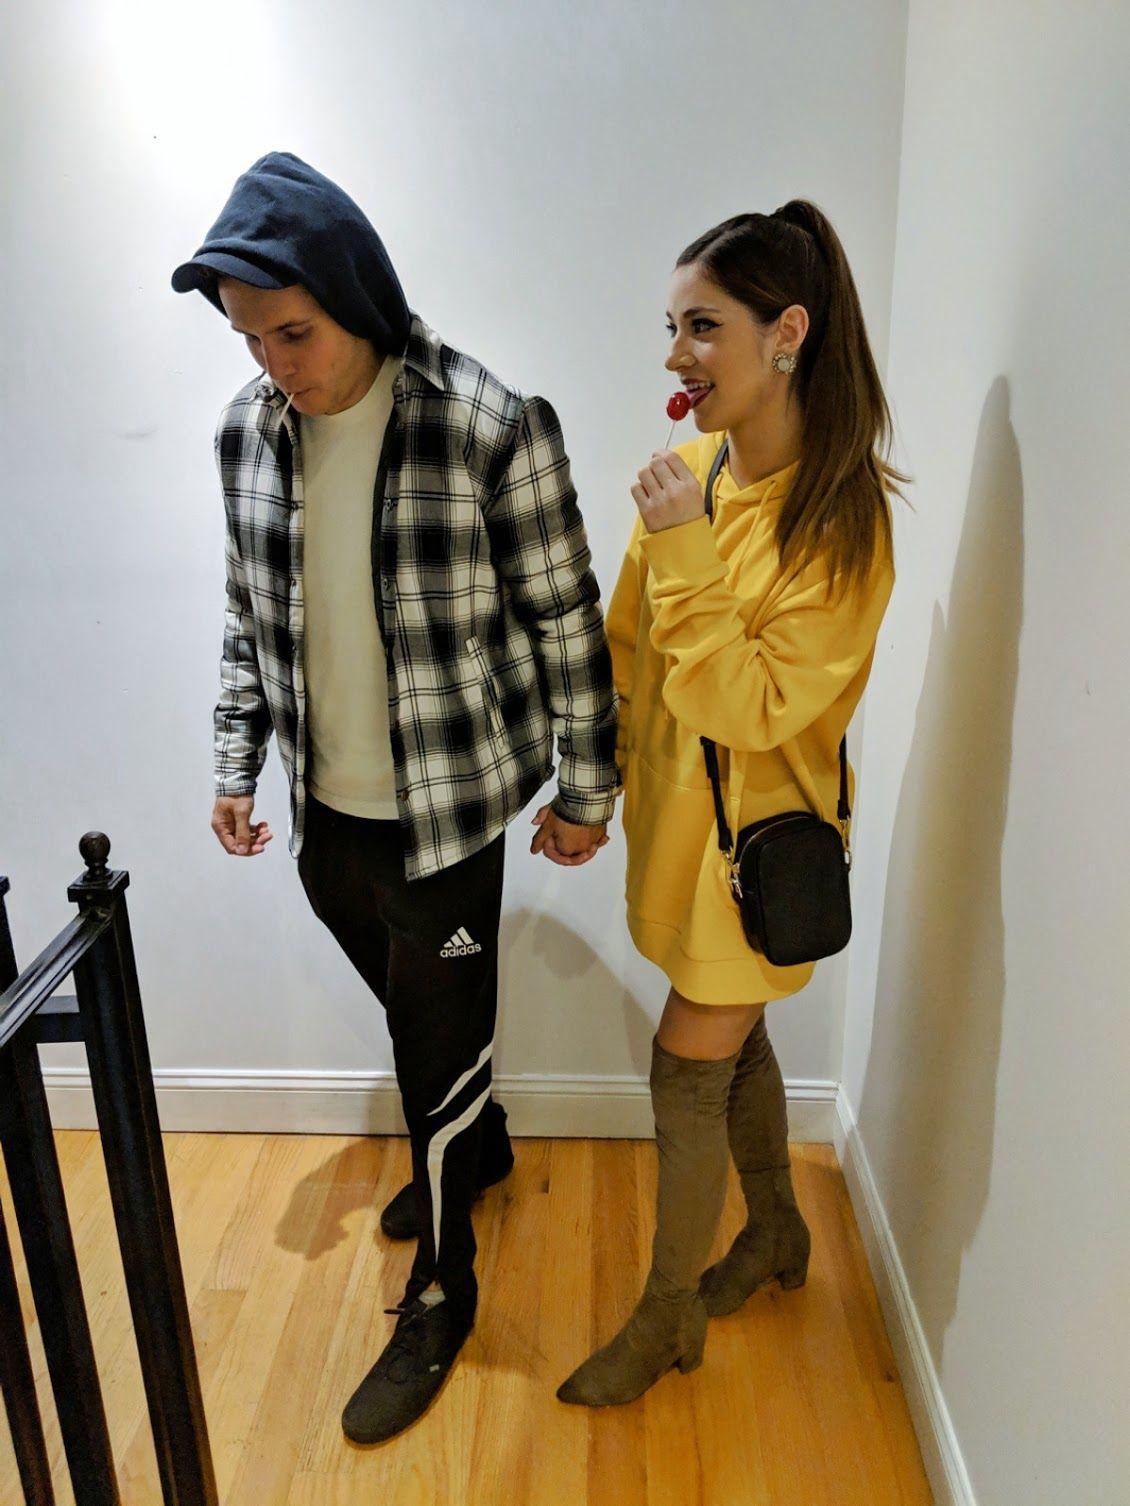 Ariana Grande and Pete Davidson Halloween Costume Couple